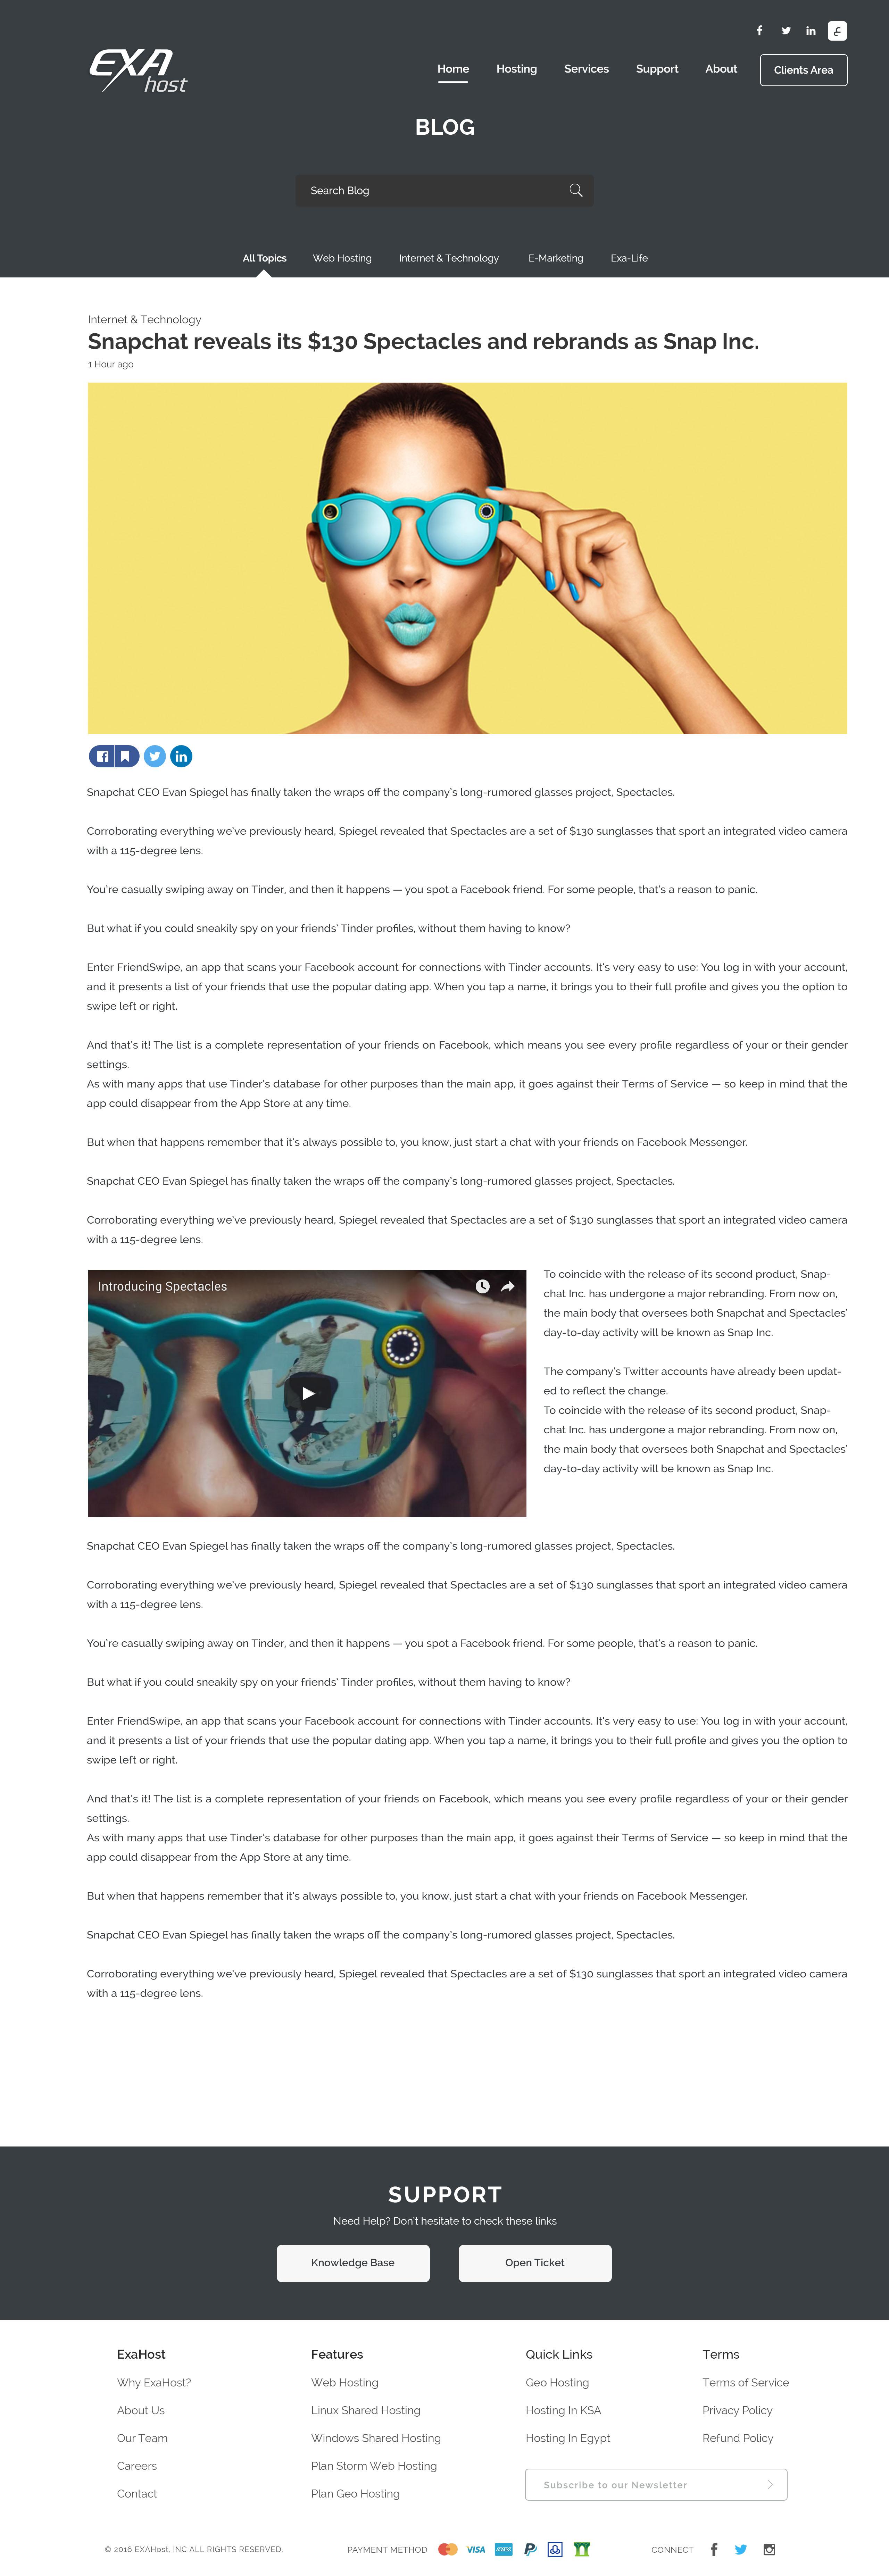 13.blog article